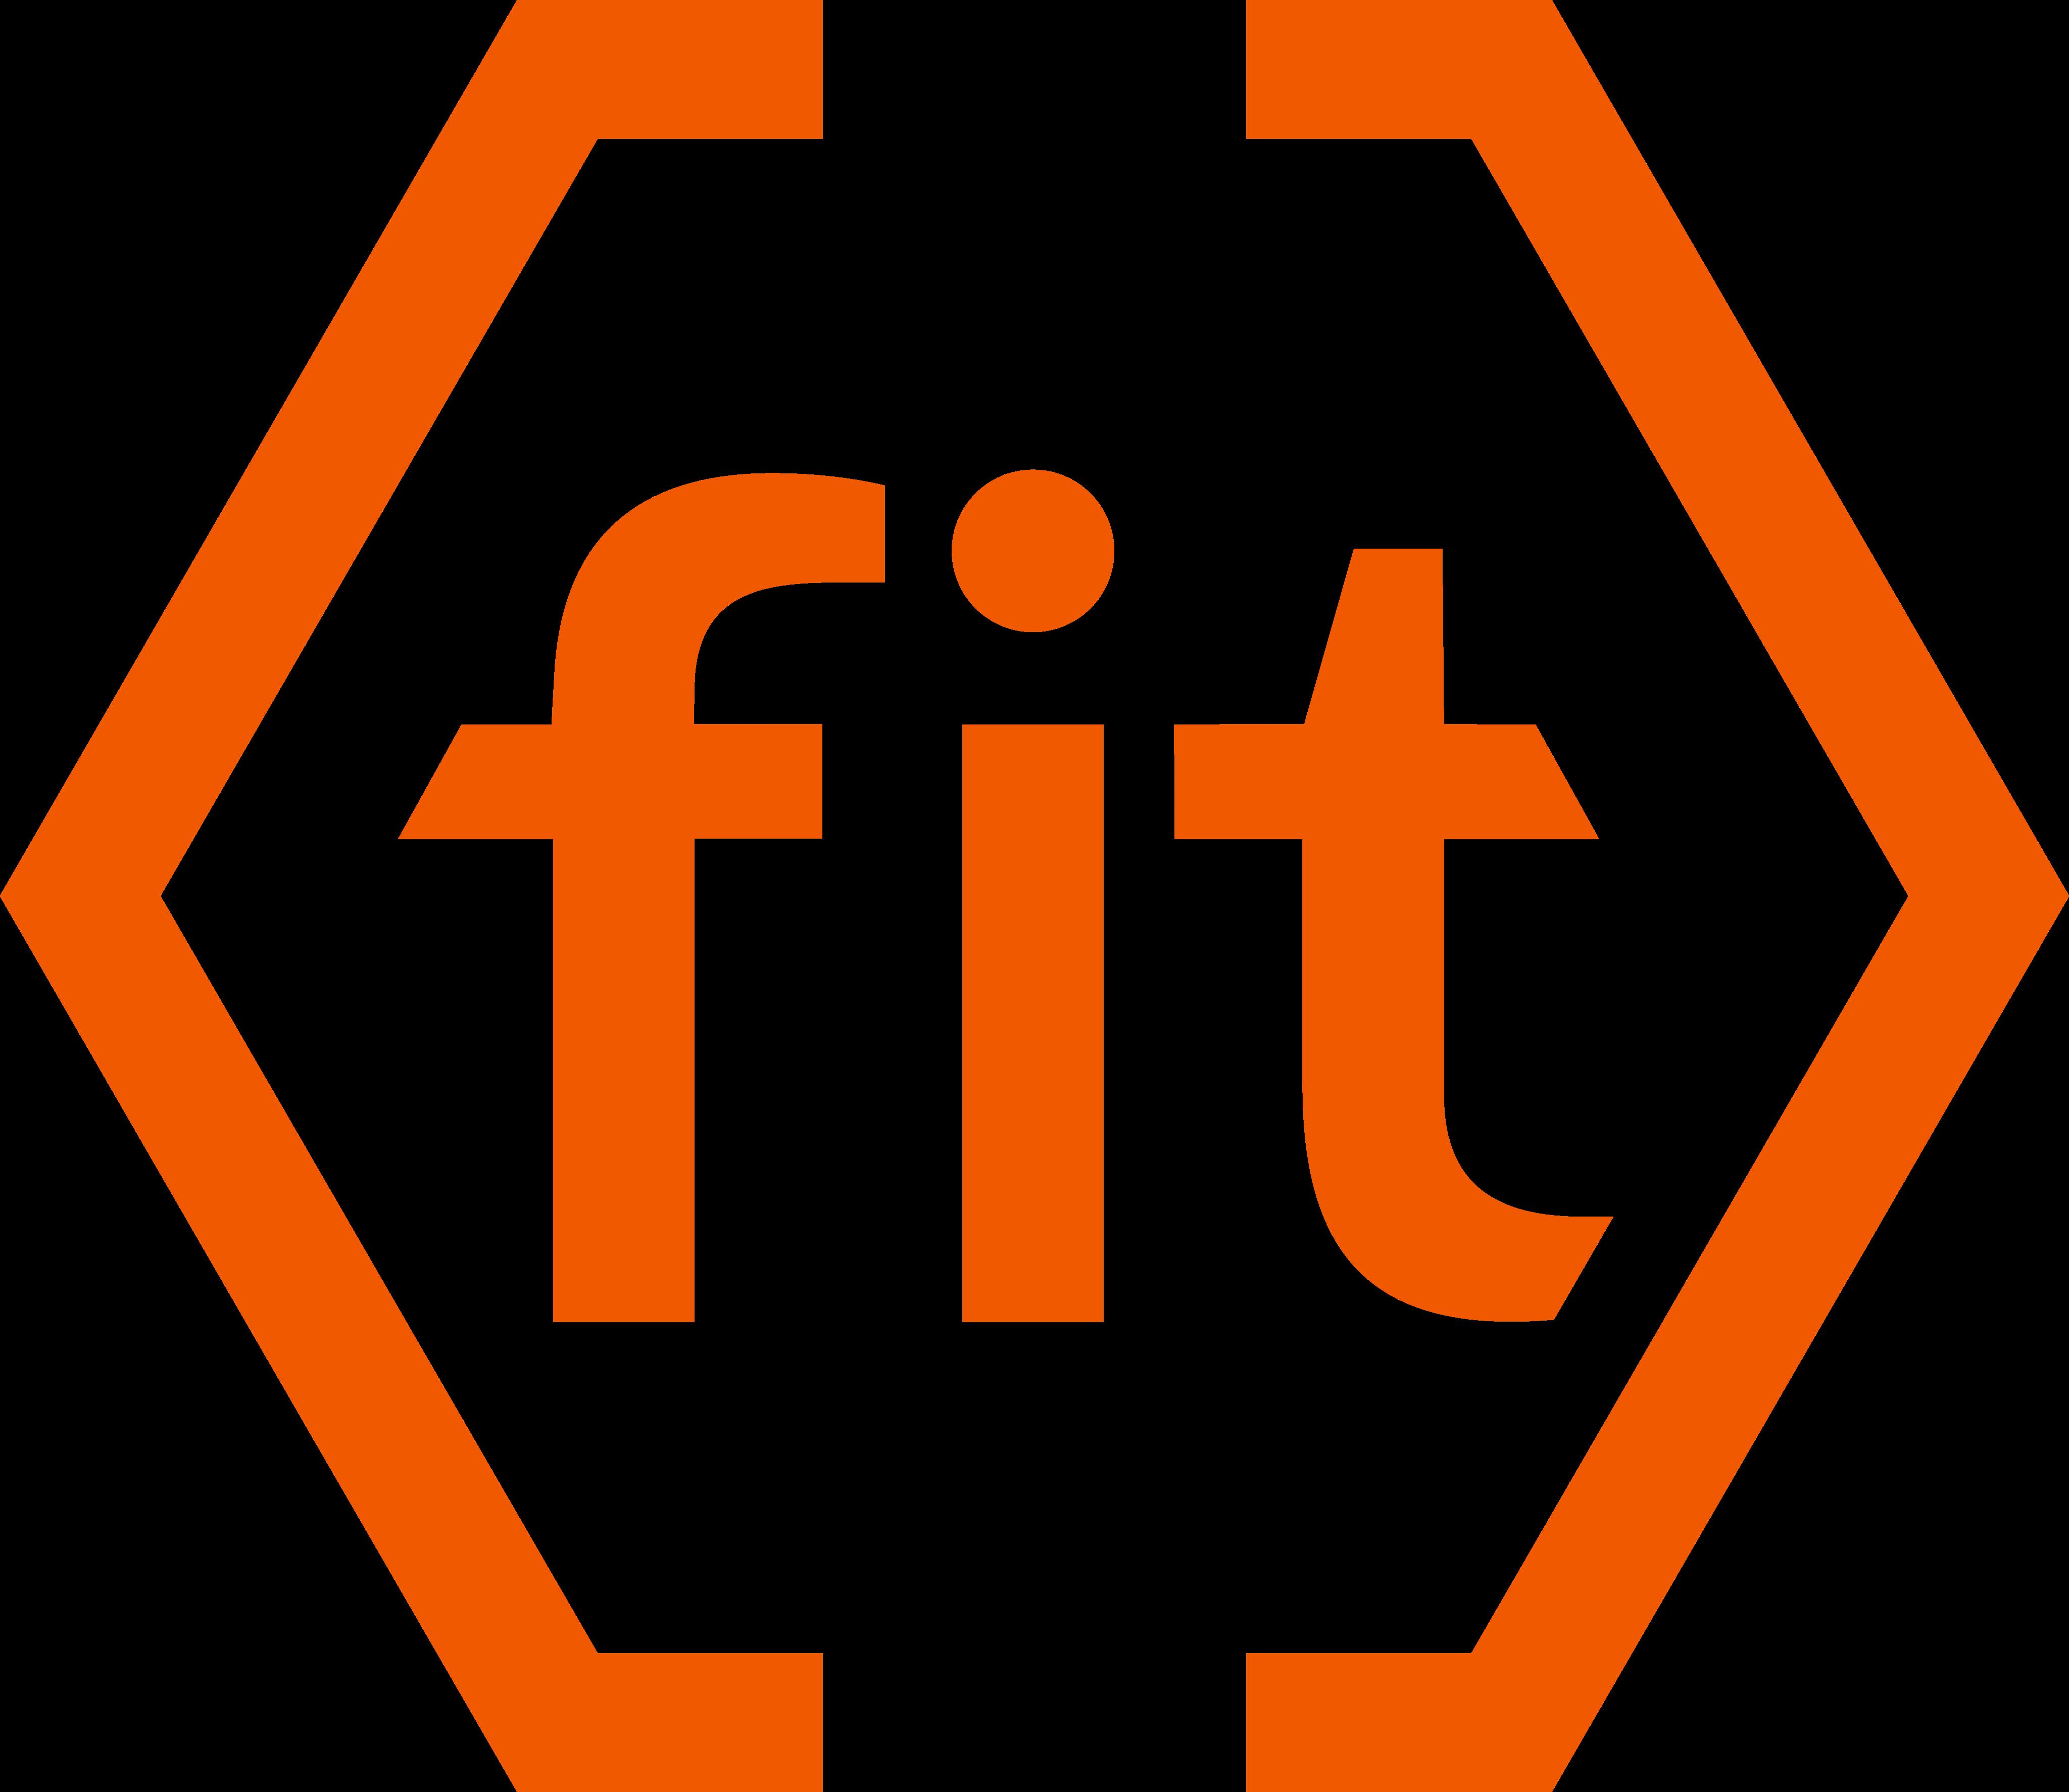 fit logo 1 - FIT Logo